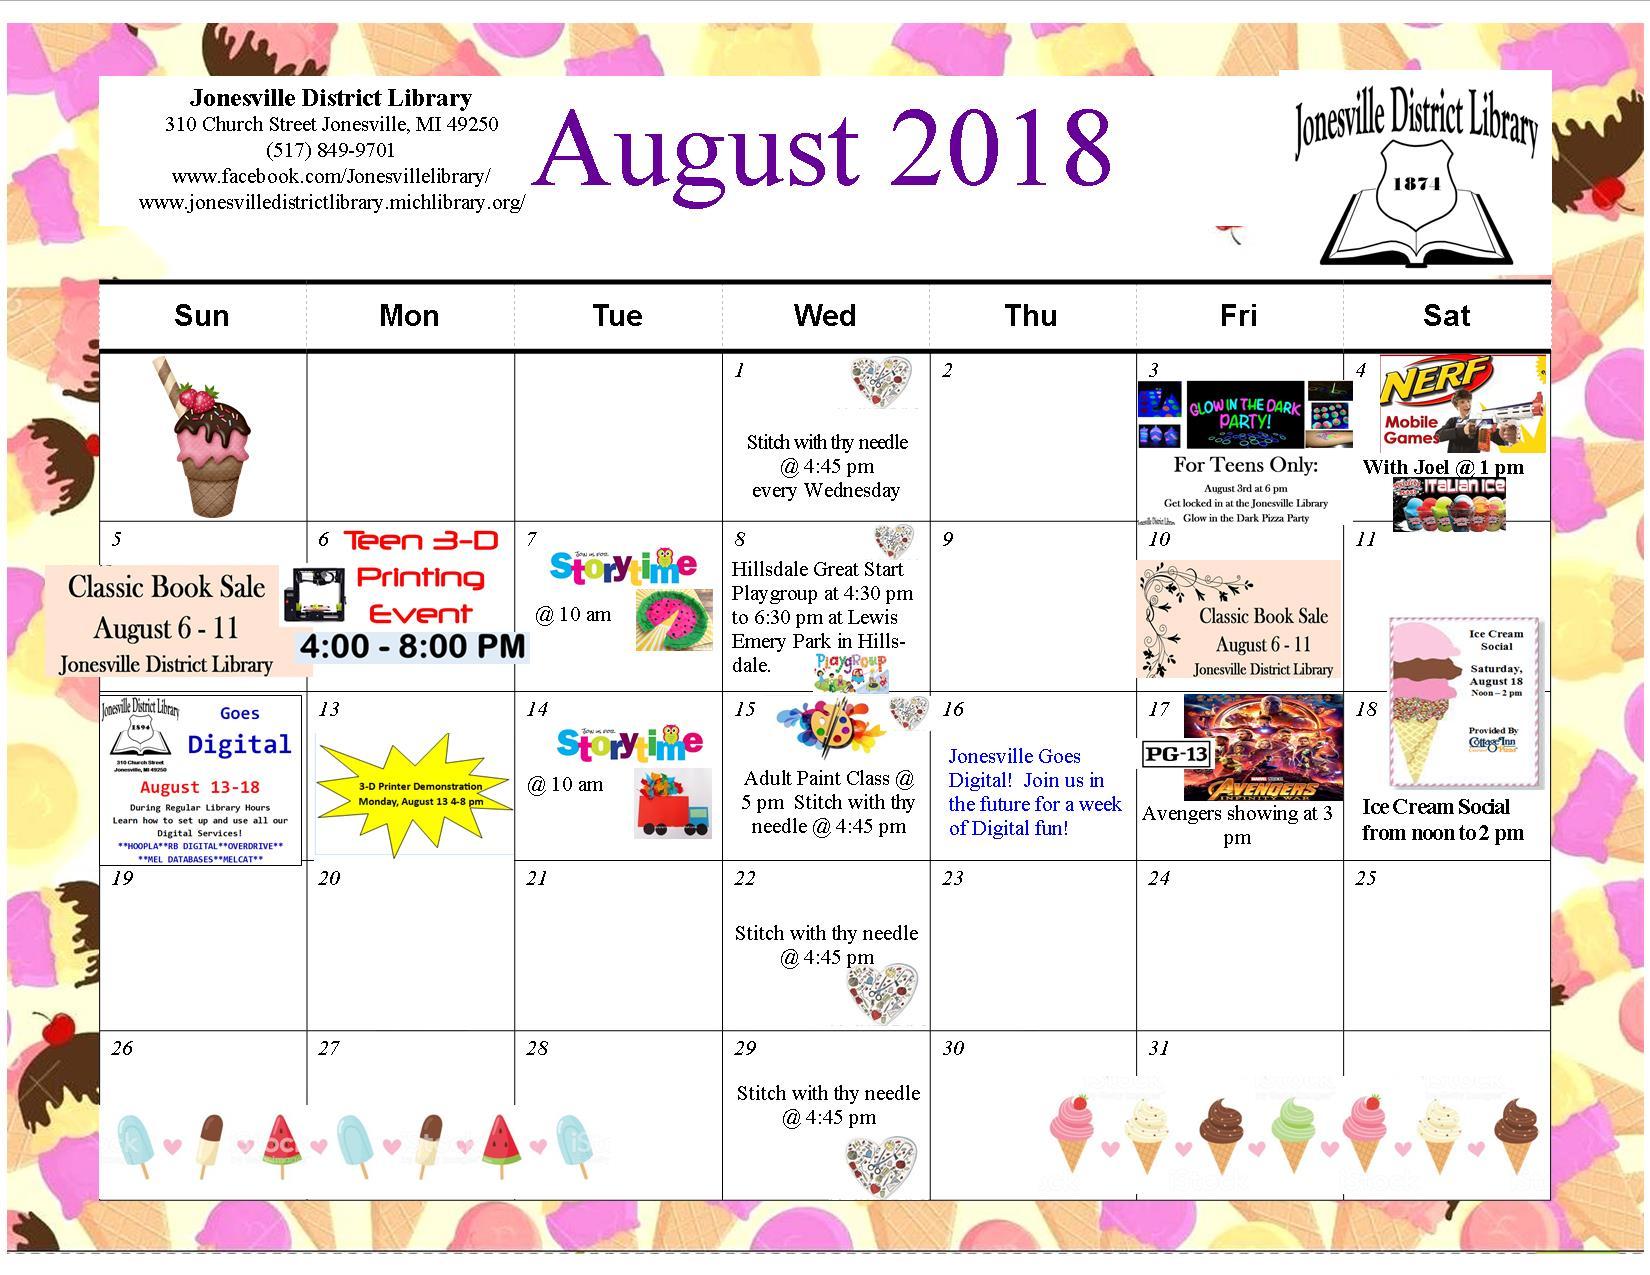 August 2018 pic.jpg